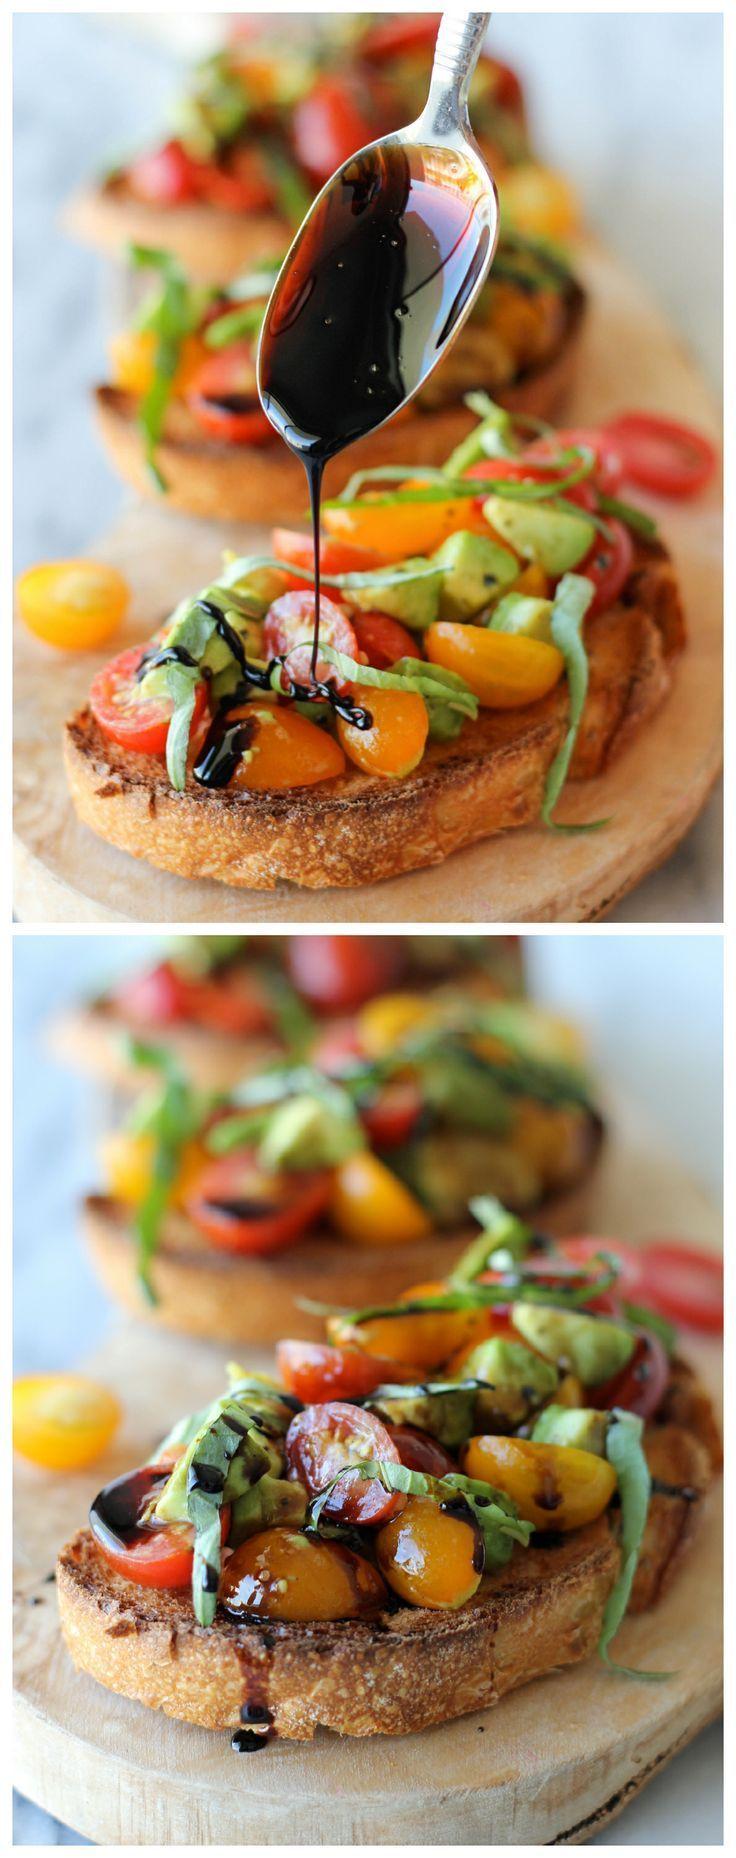 Avocado Bruschetta with Balsamic Reduction | healthy recipe ideas @xhealthyrecipex |